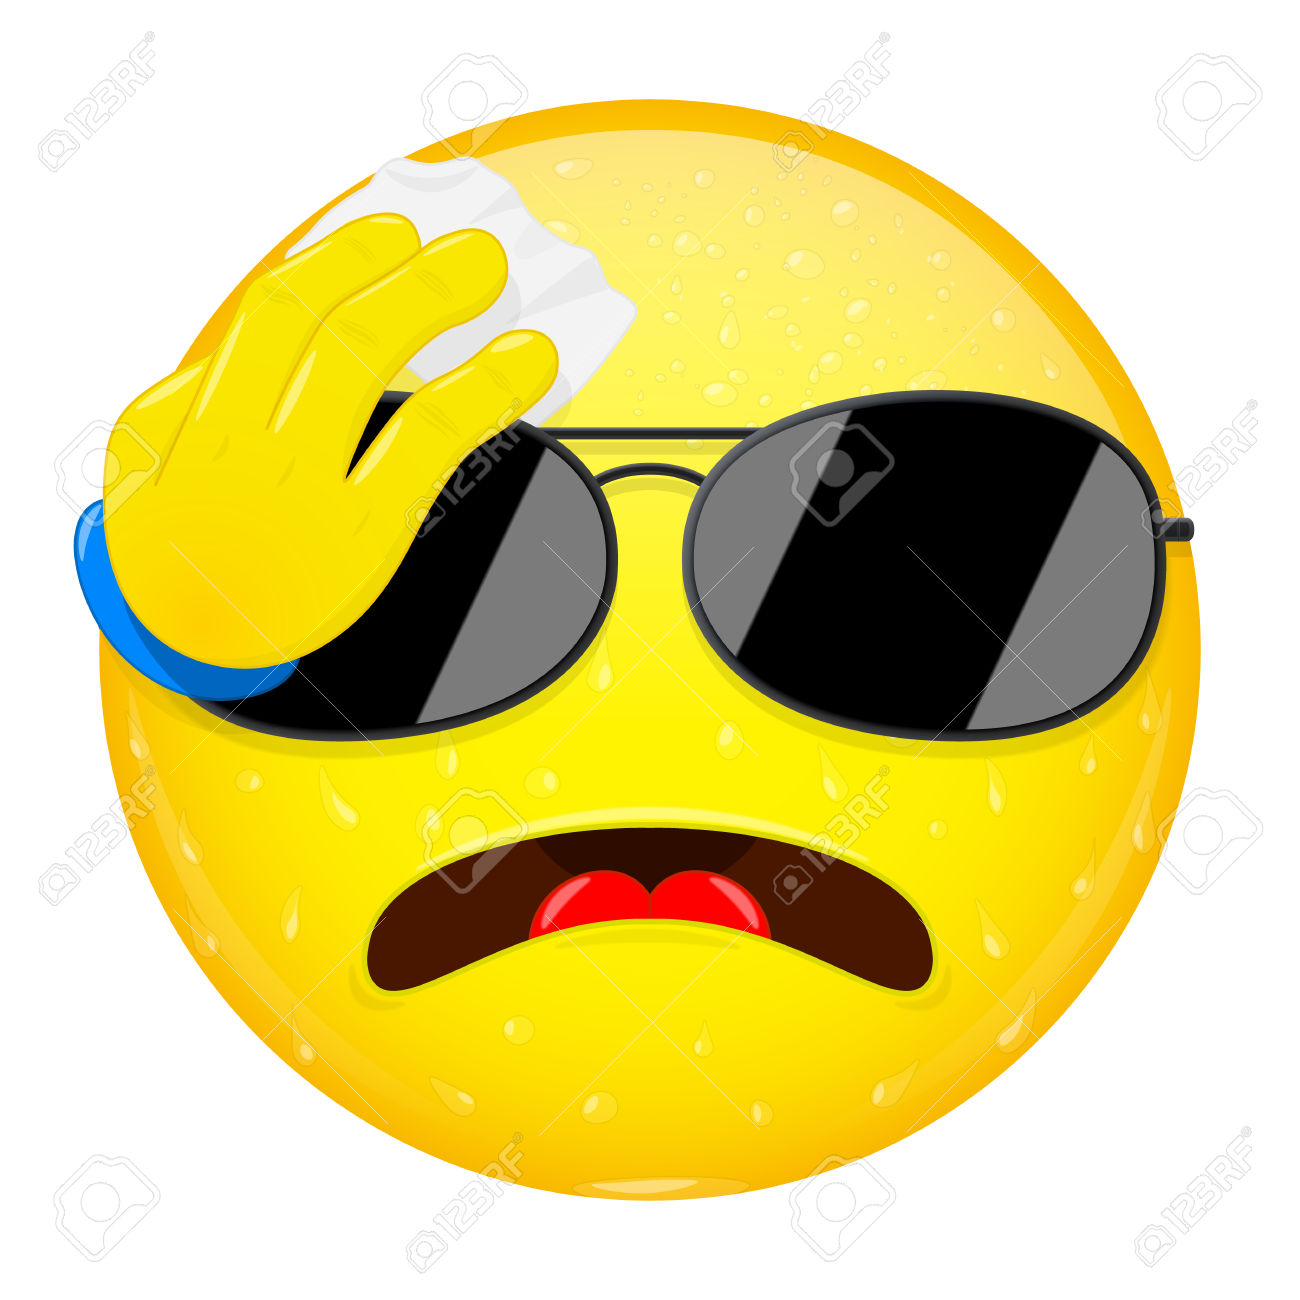 Emoji Wipes The Sweat With A Handkerchief. Hard Work, Heat.